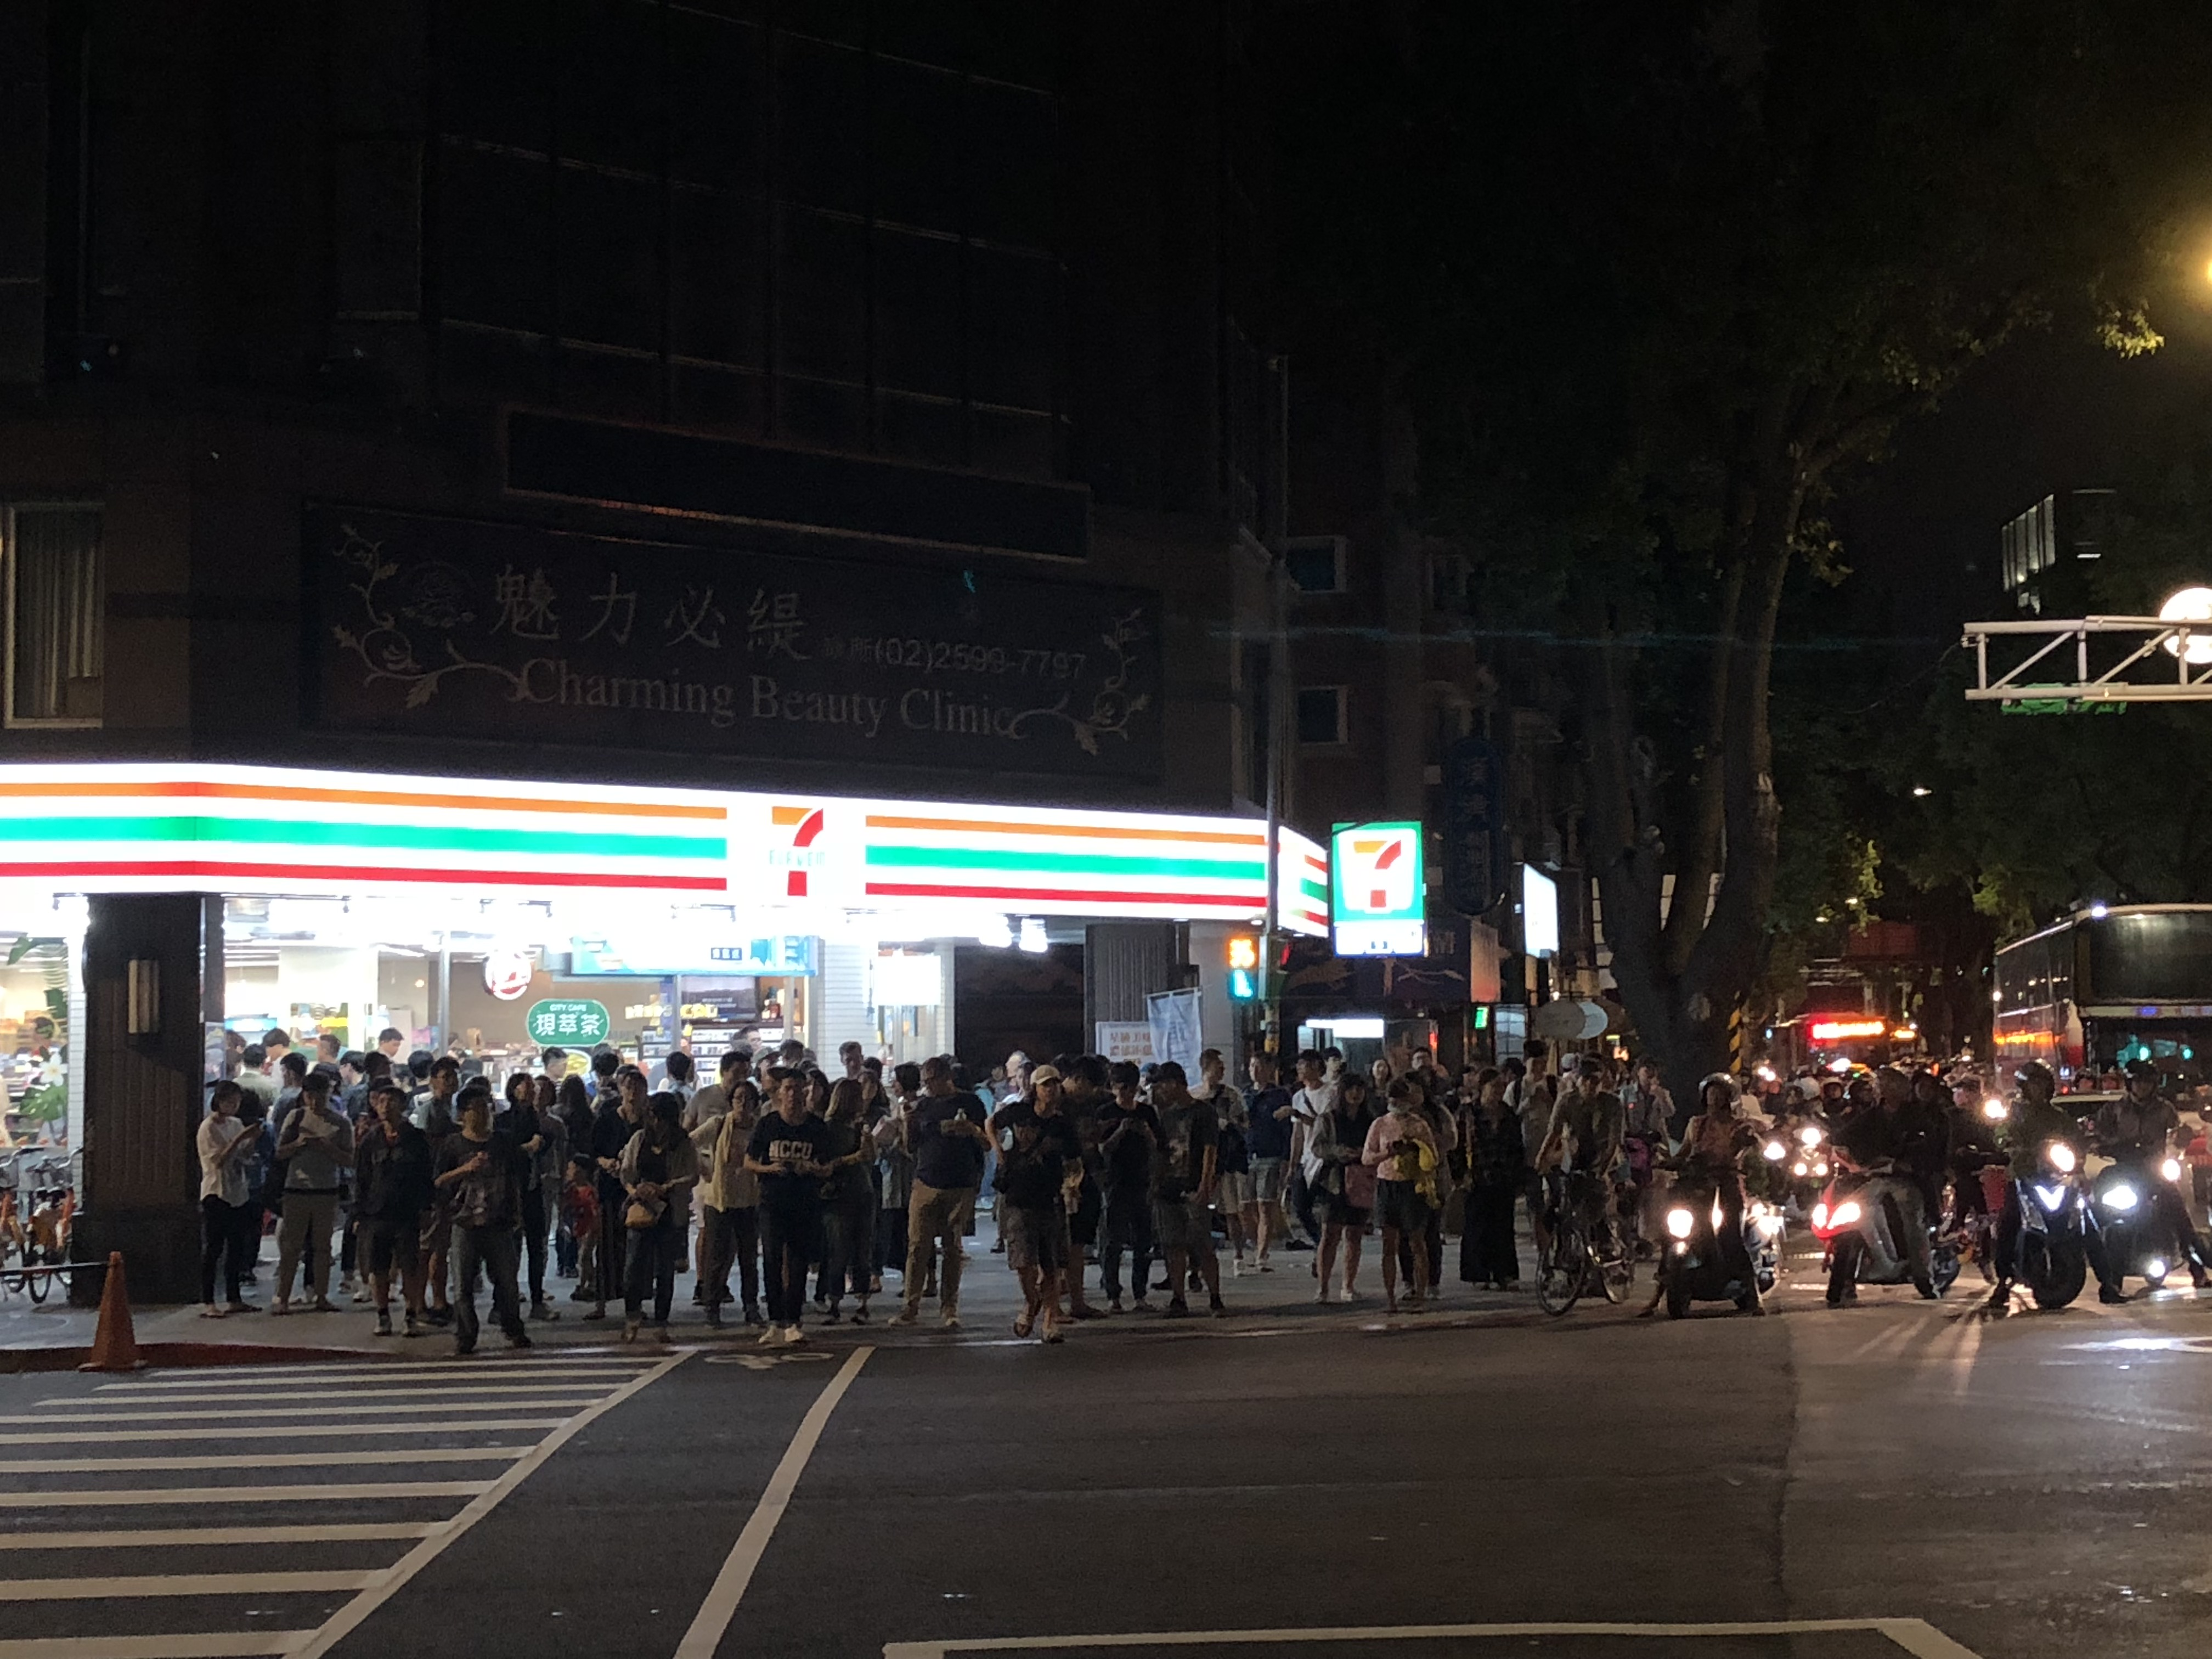 Crowded 7-Eleven